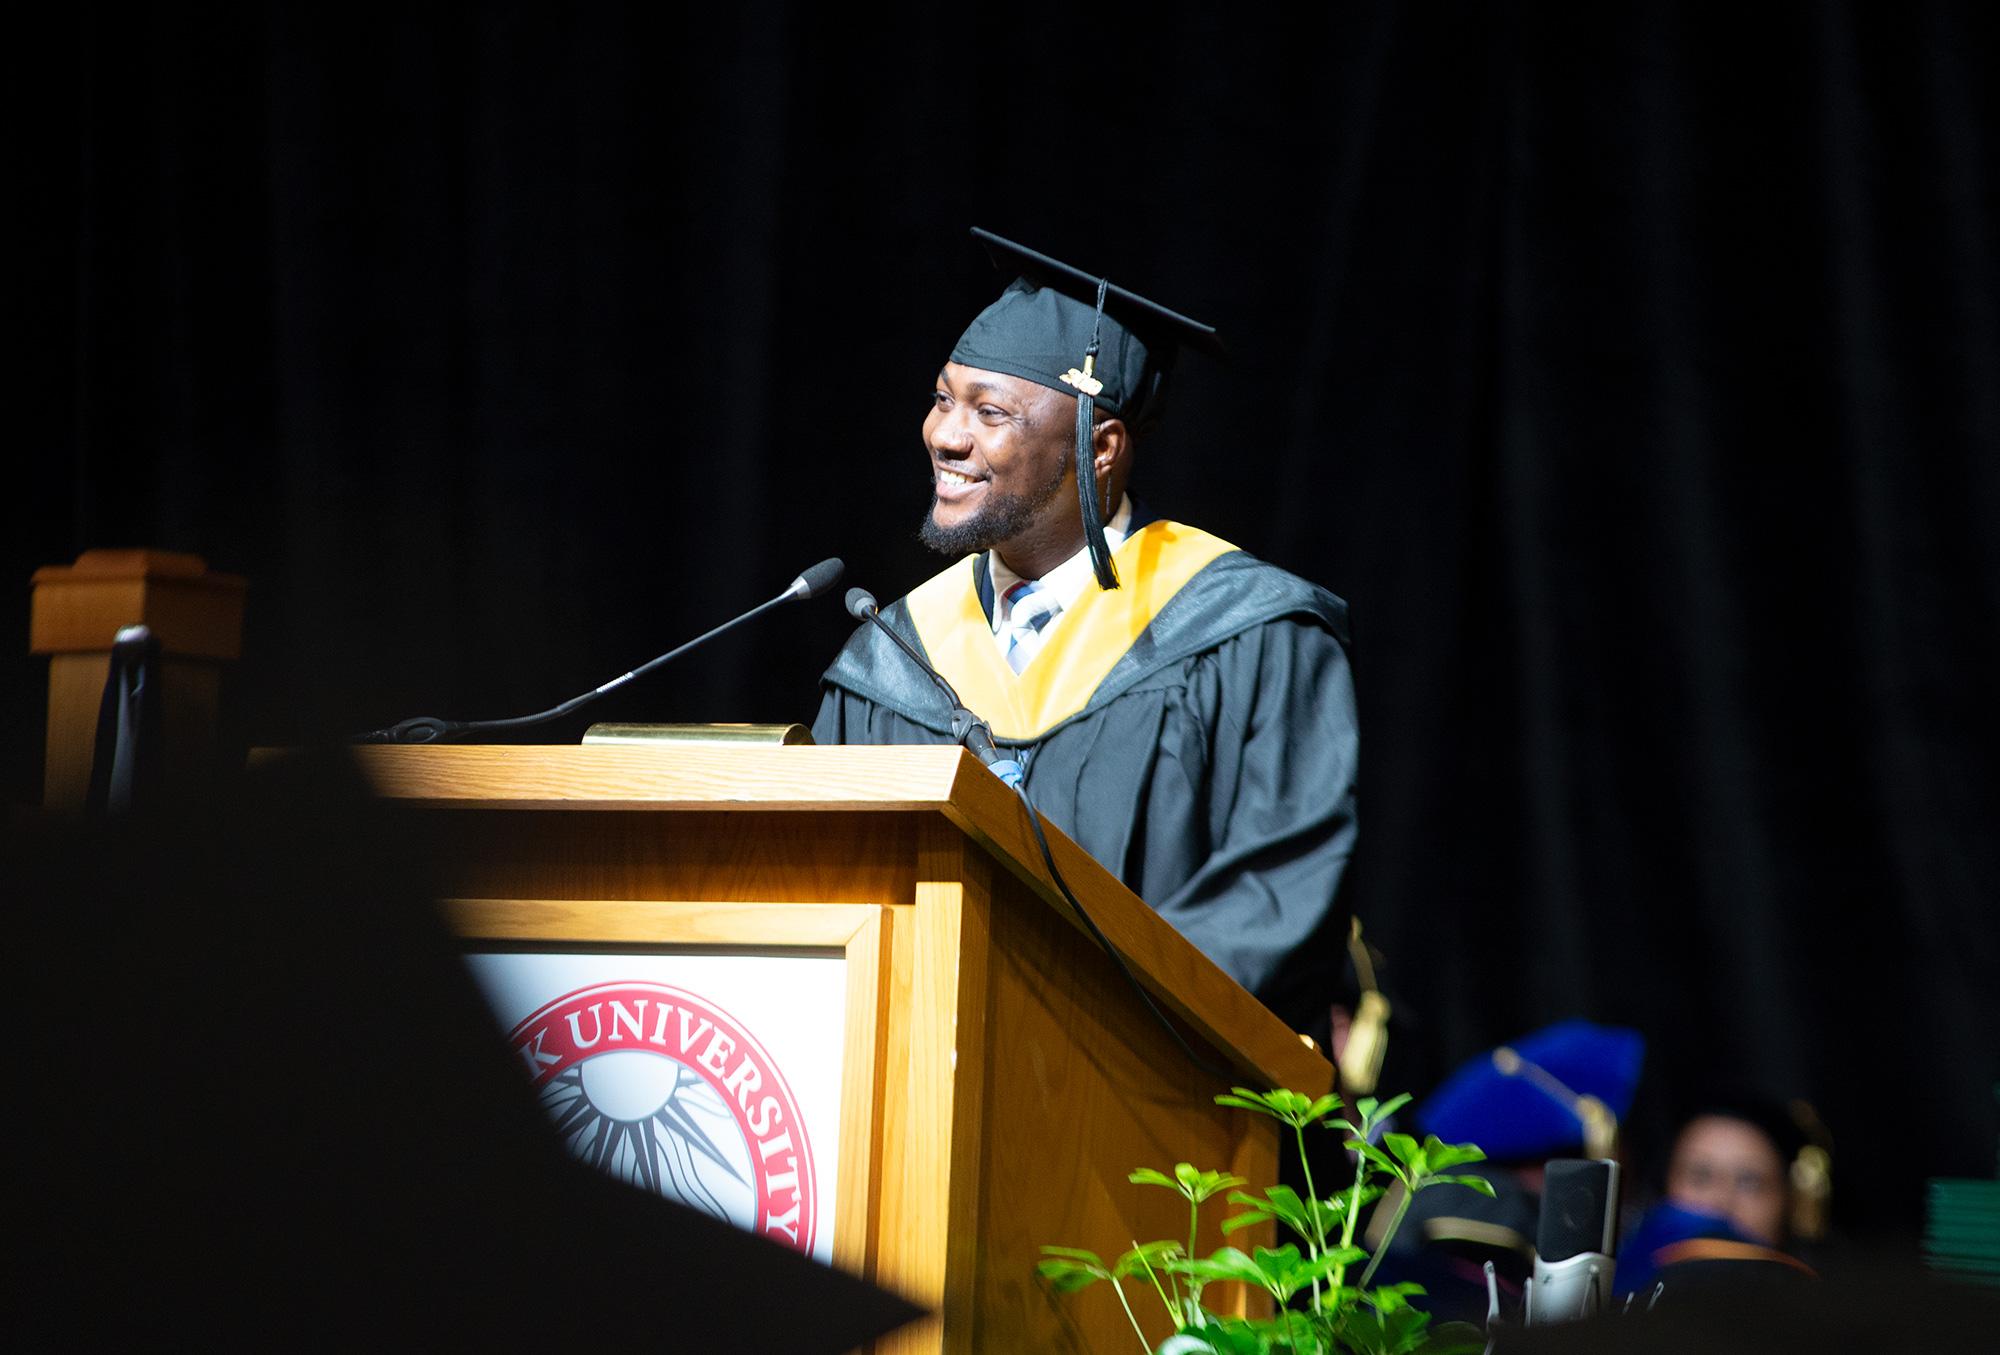 Michael-Grad-Student-speaker